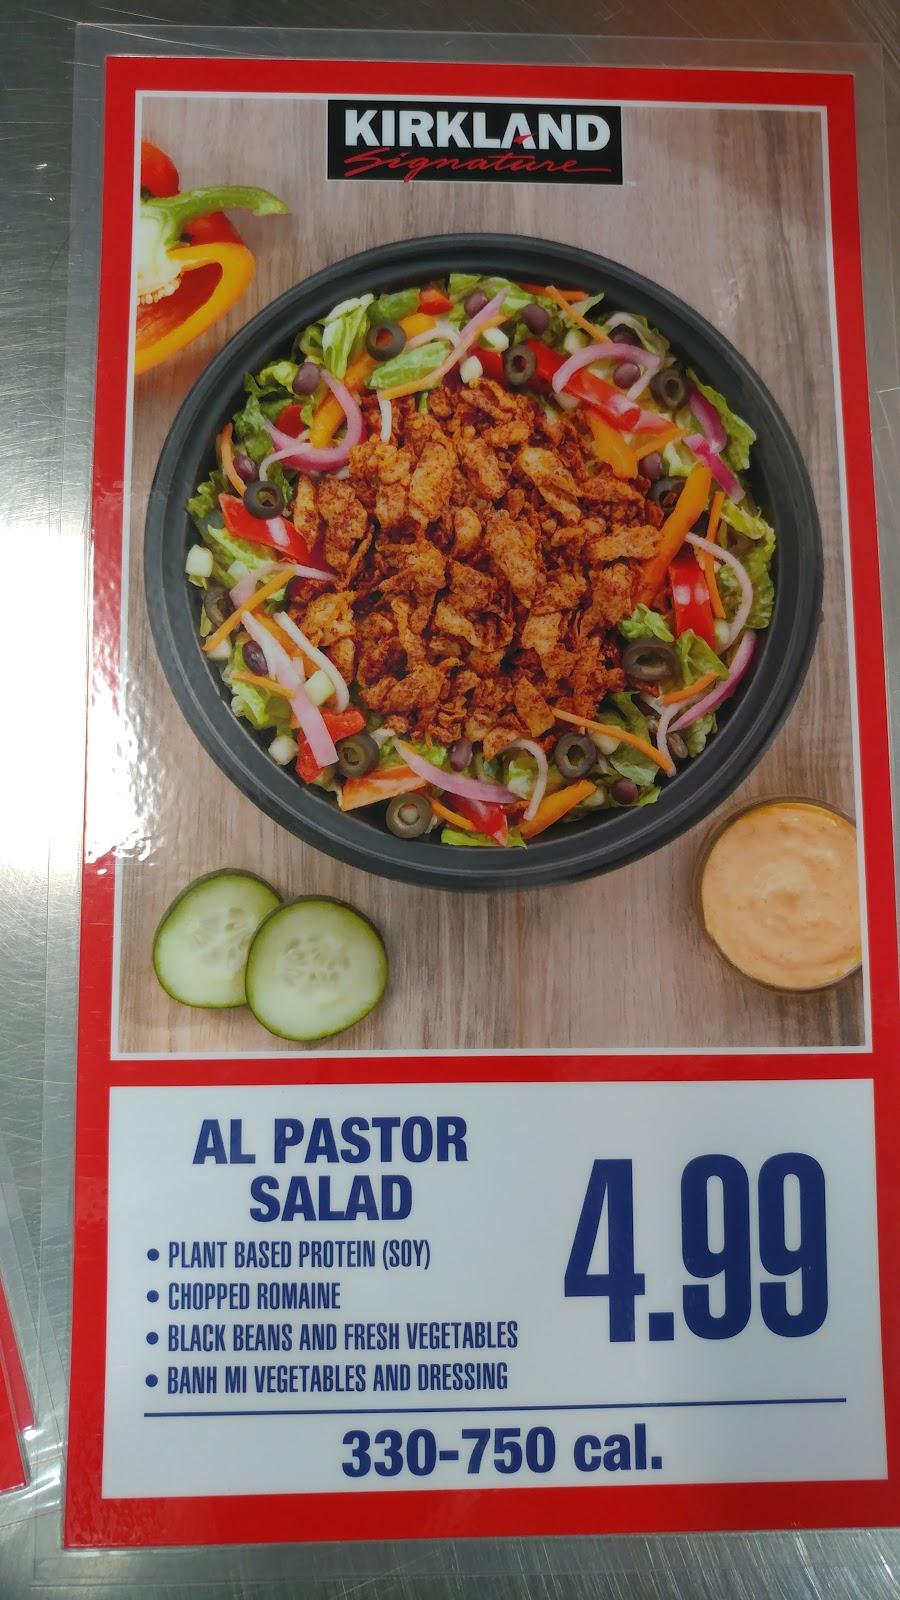 Costco Food Court - meal takeaway  | Photo 6 of 6 | Address: 17550 N 79th Ave, Glendale, AZ 85308, USA | Phone: (623) 776-4003